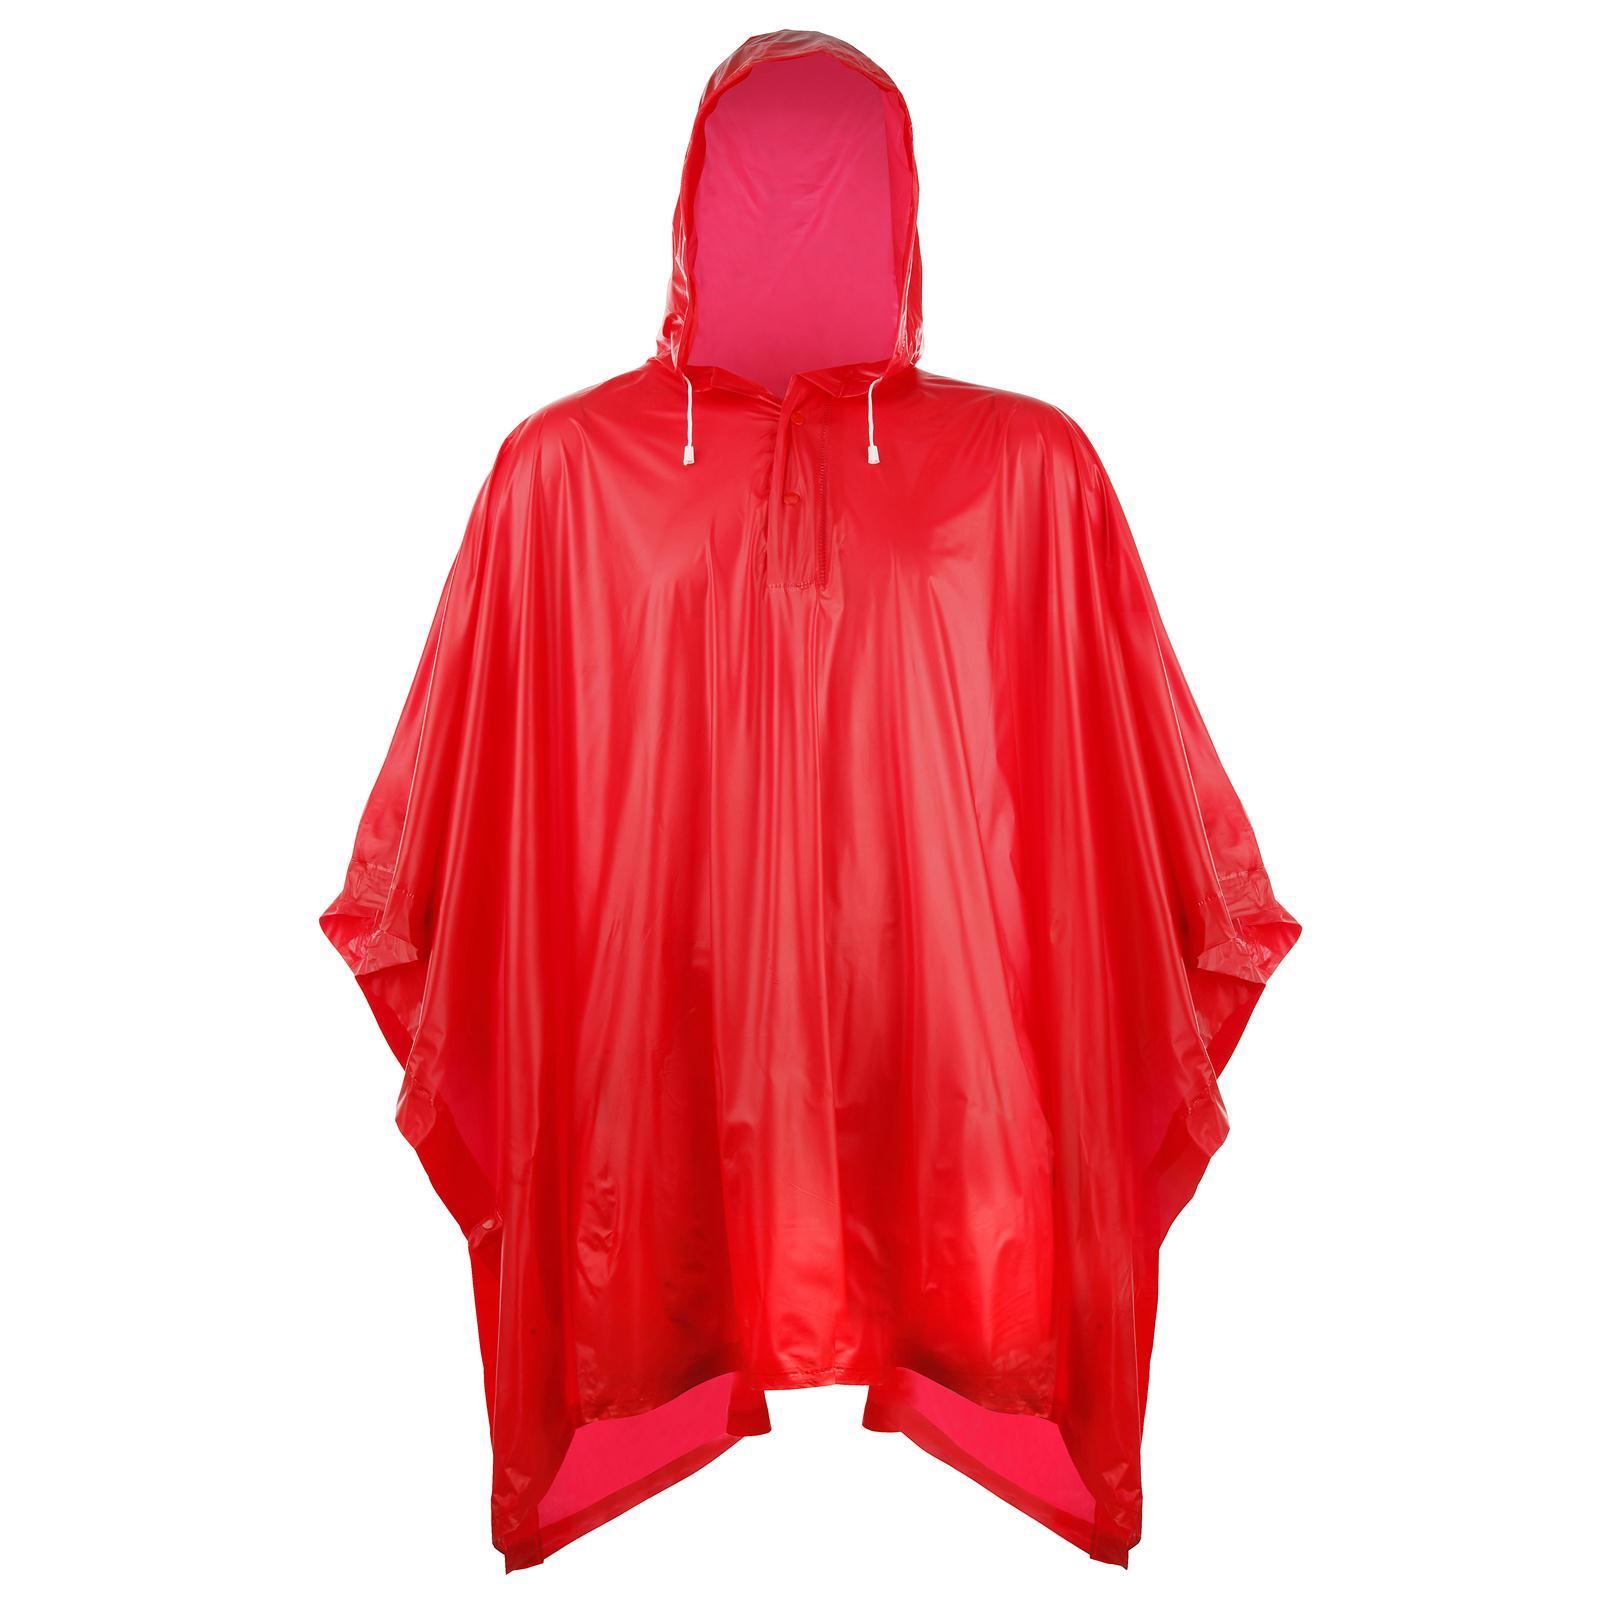 Rain Coat Clip Art Rain Jacket Clipart - ...